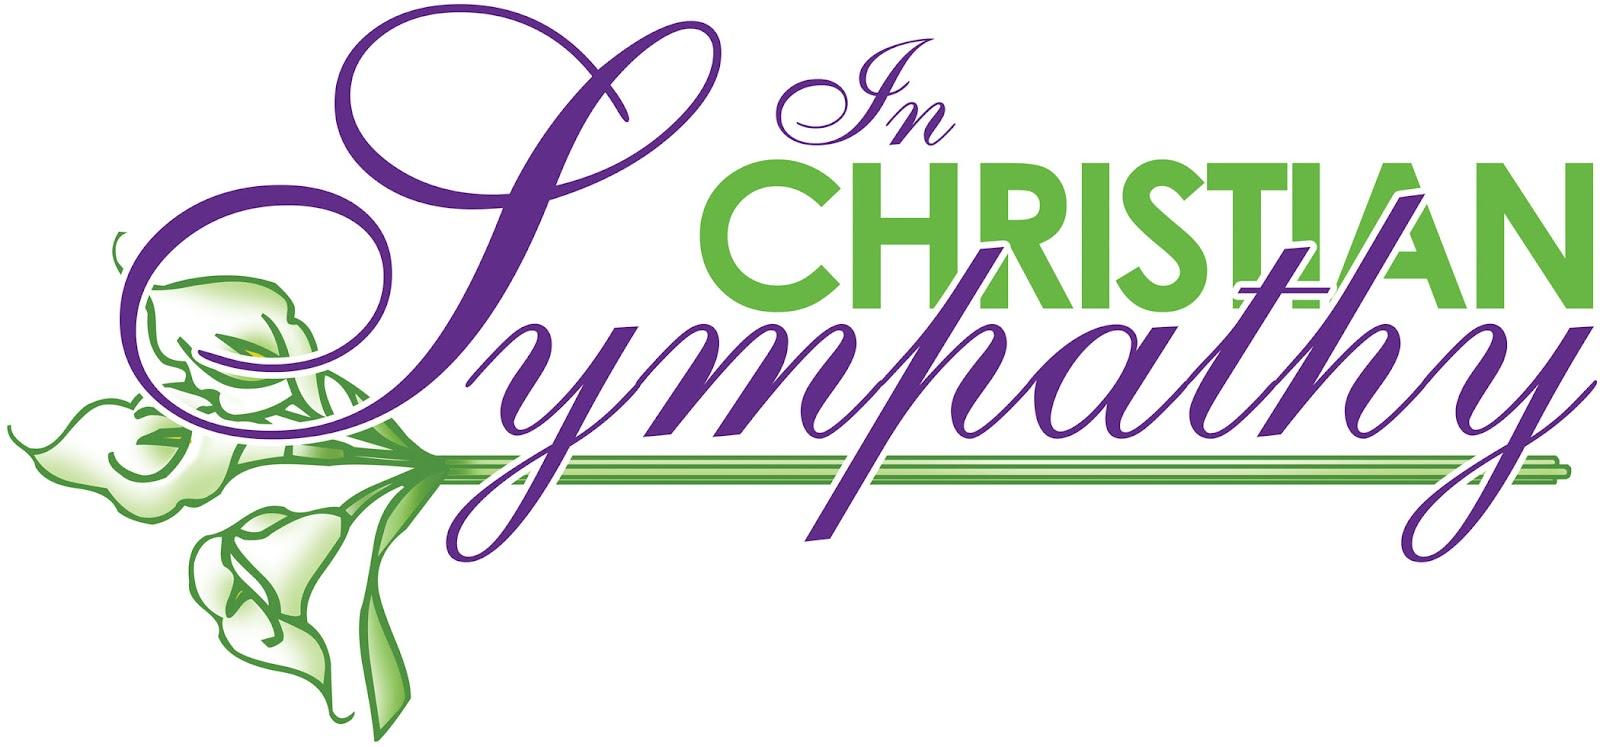 1600x747 Christian Newsletter Clipart